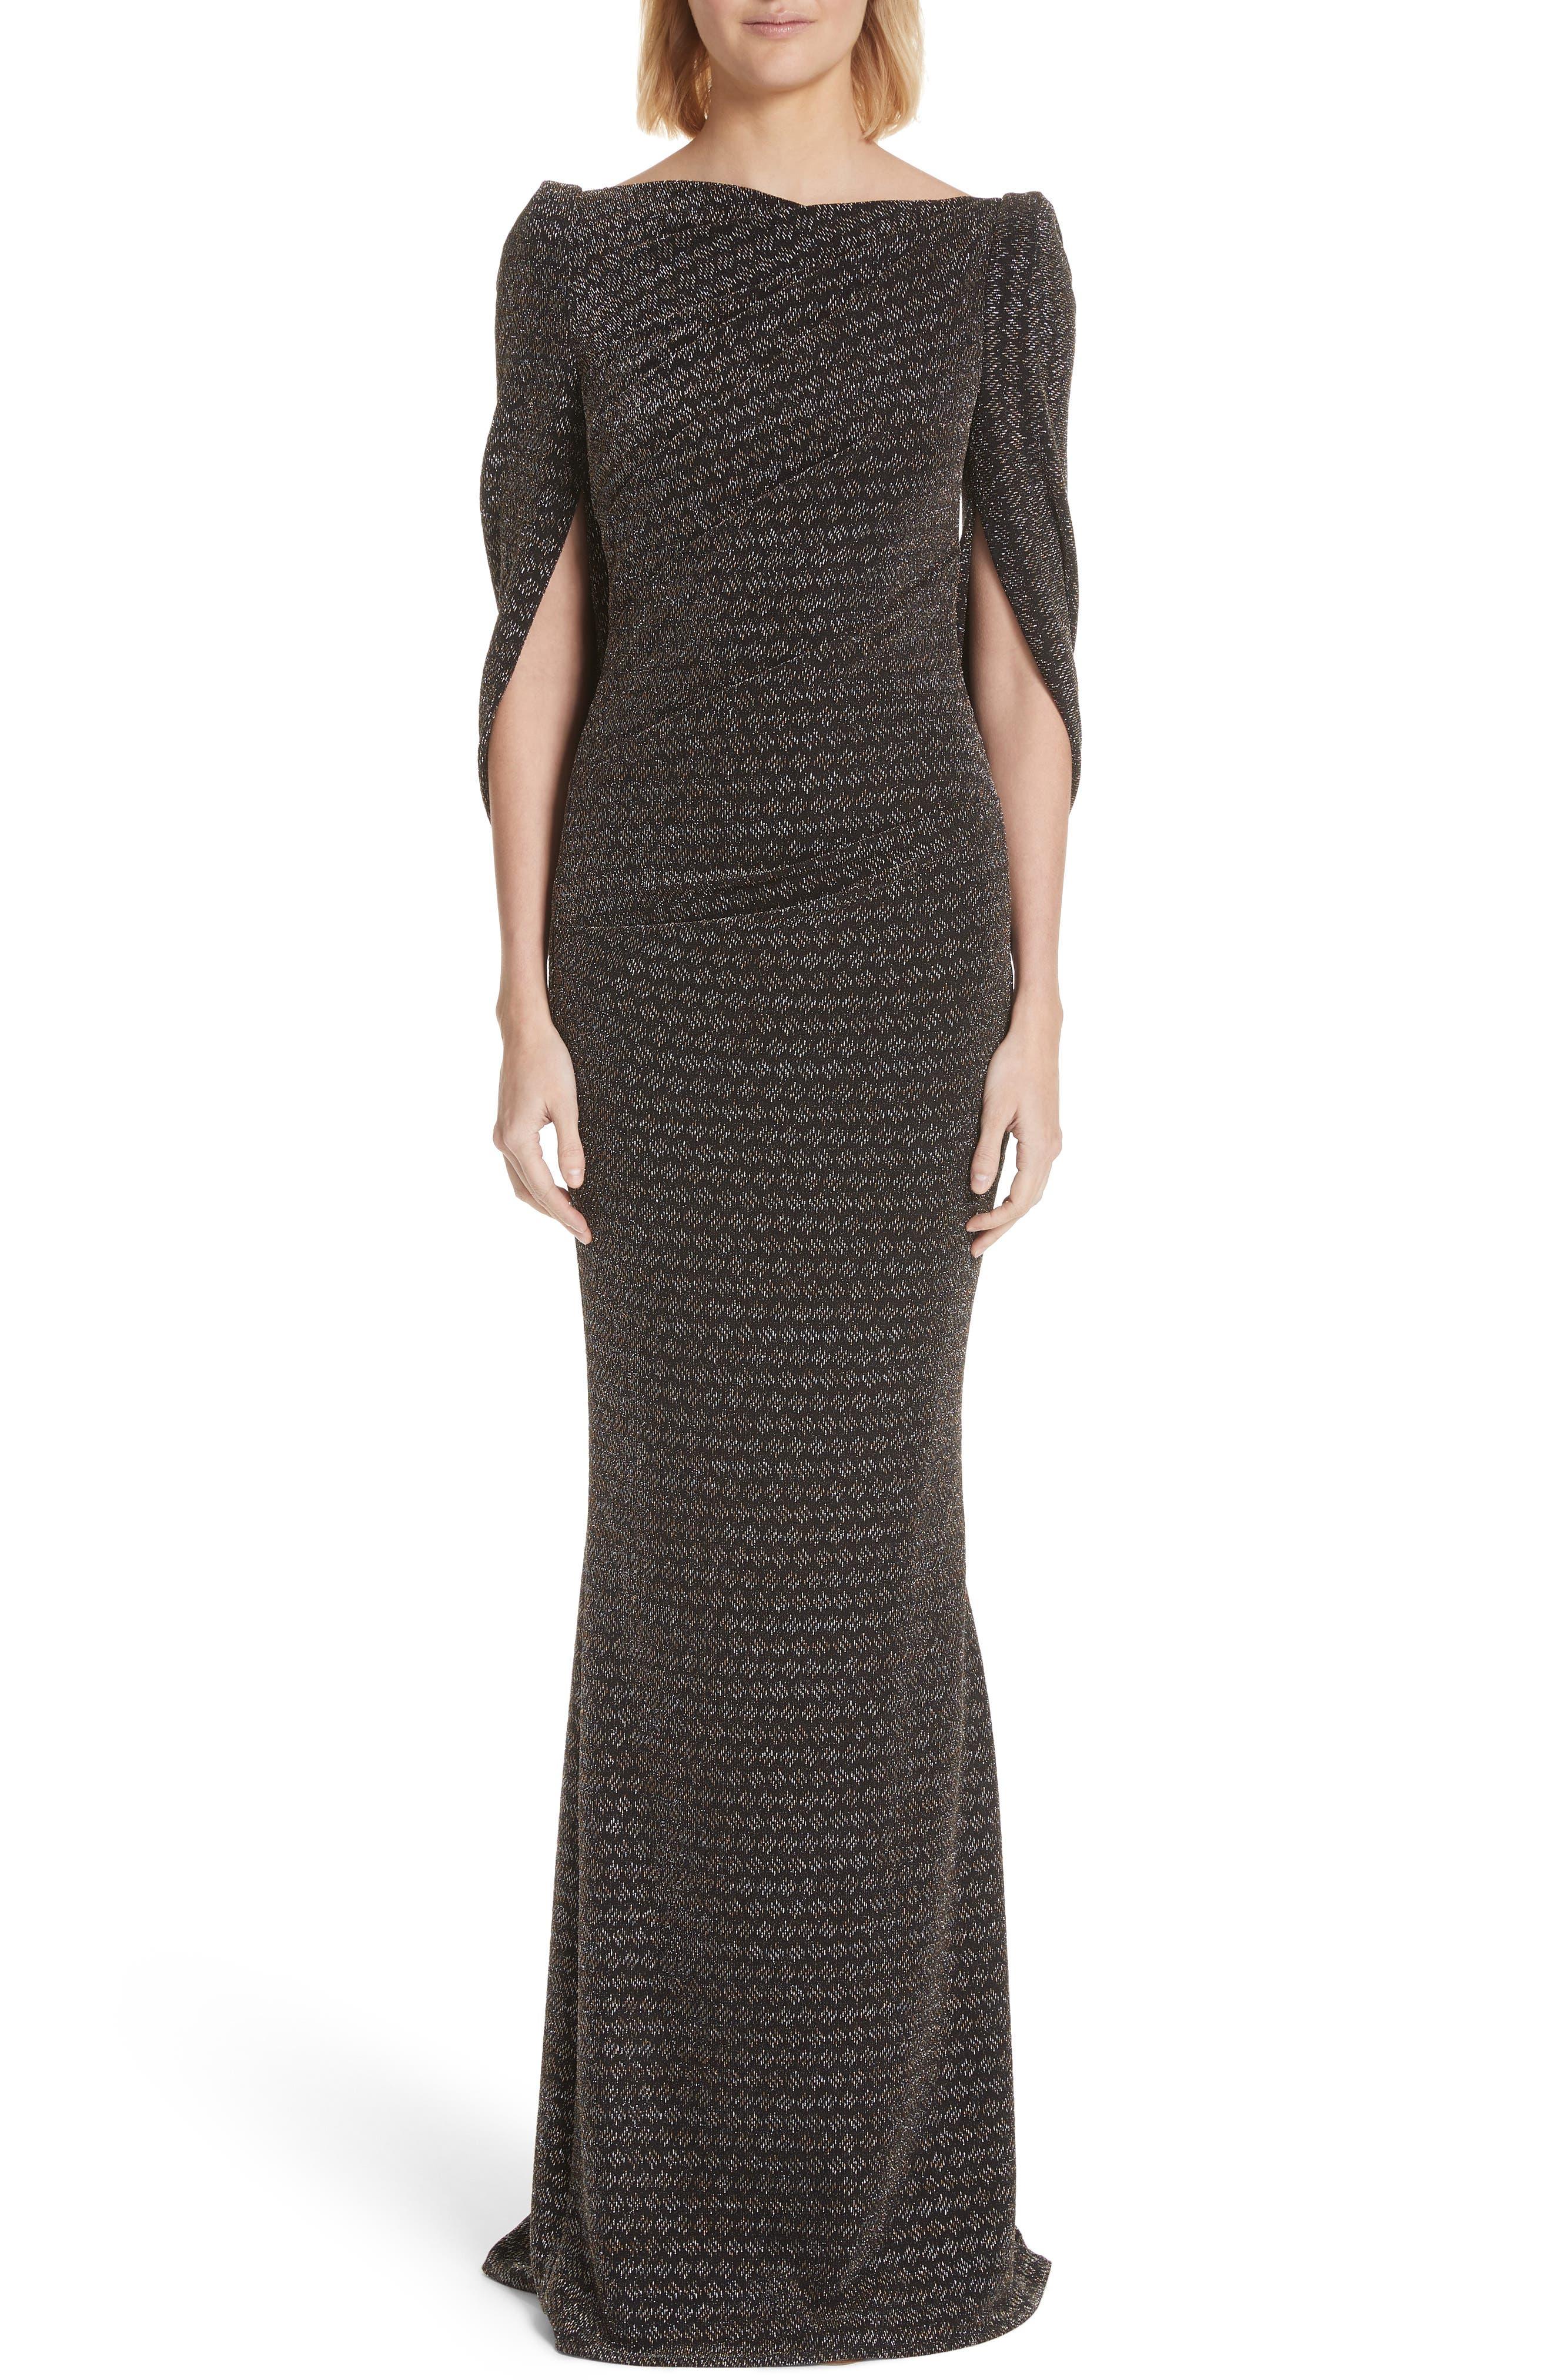 Talbot Runhof 5Th Element Metallic Jersey Mermaid Gown, Black